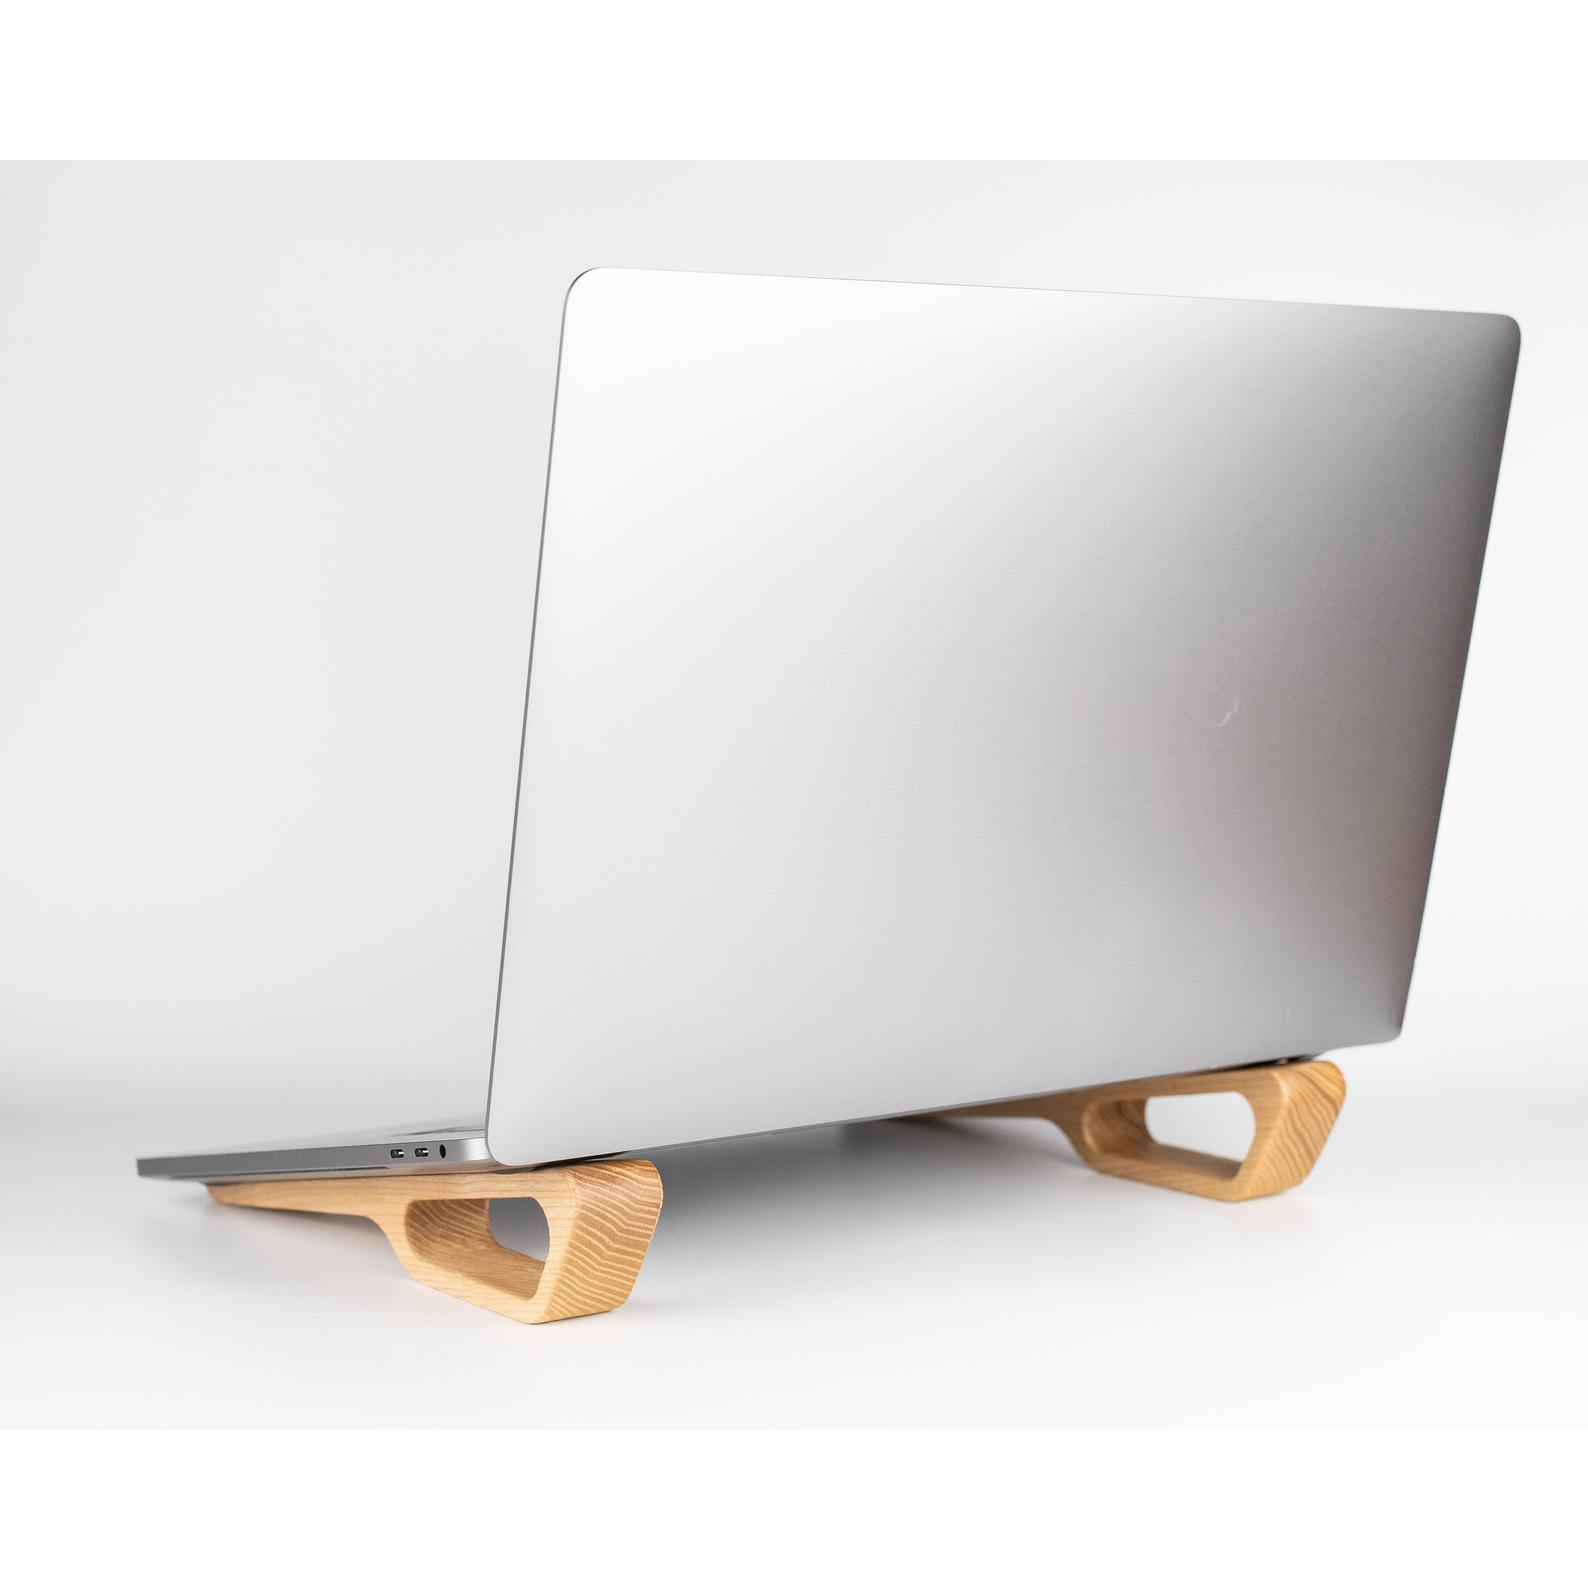 Giá Đỡ Laptop, Kệ Laptop Gỗ TADPOLE